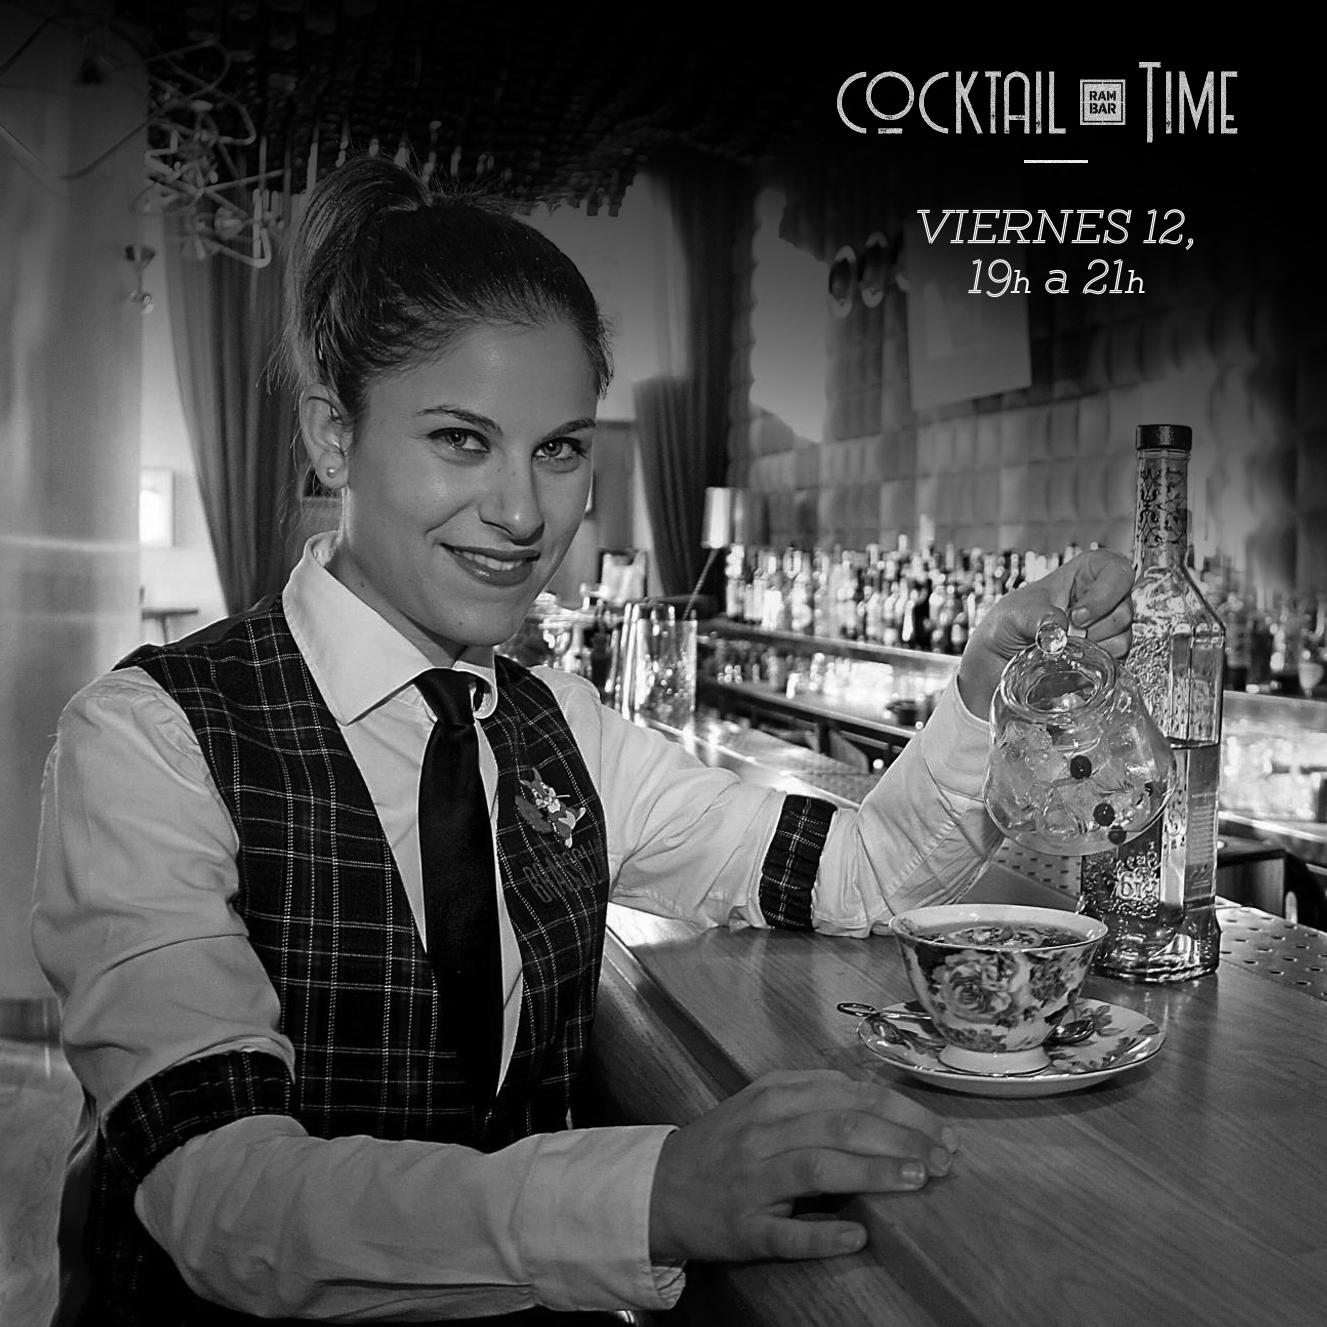 Laura Pelarda le pone un toque asiático a Cocktail Time